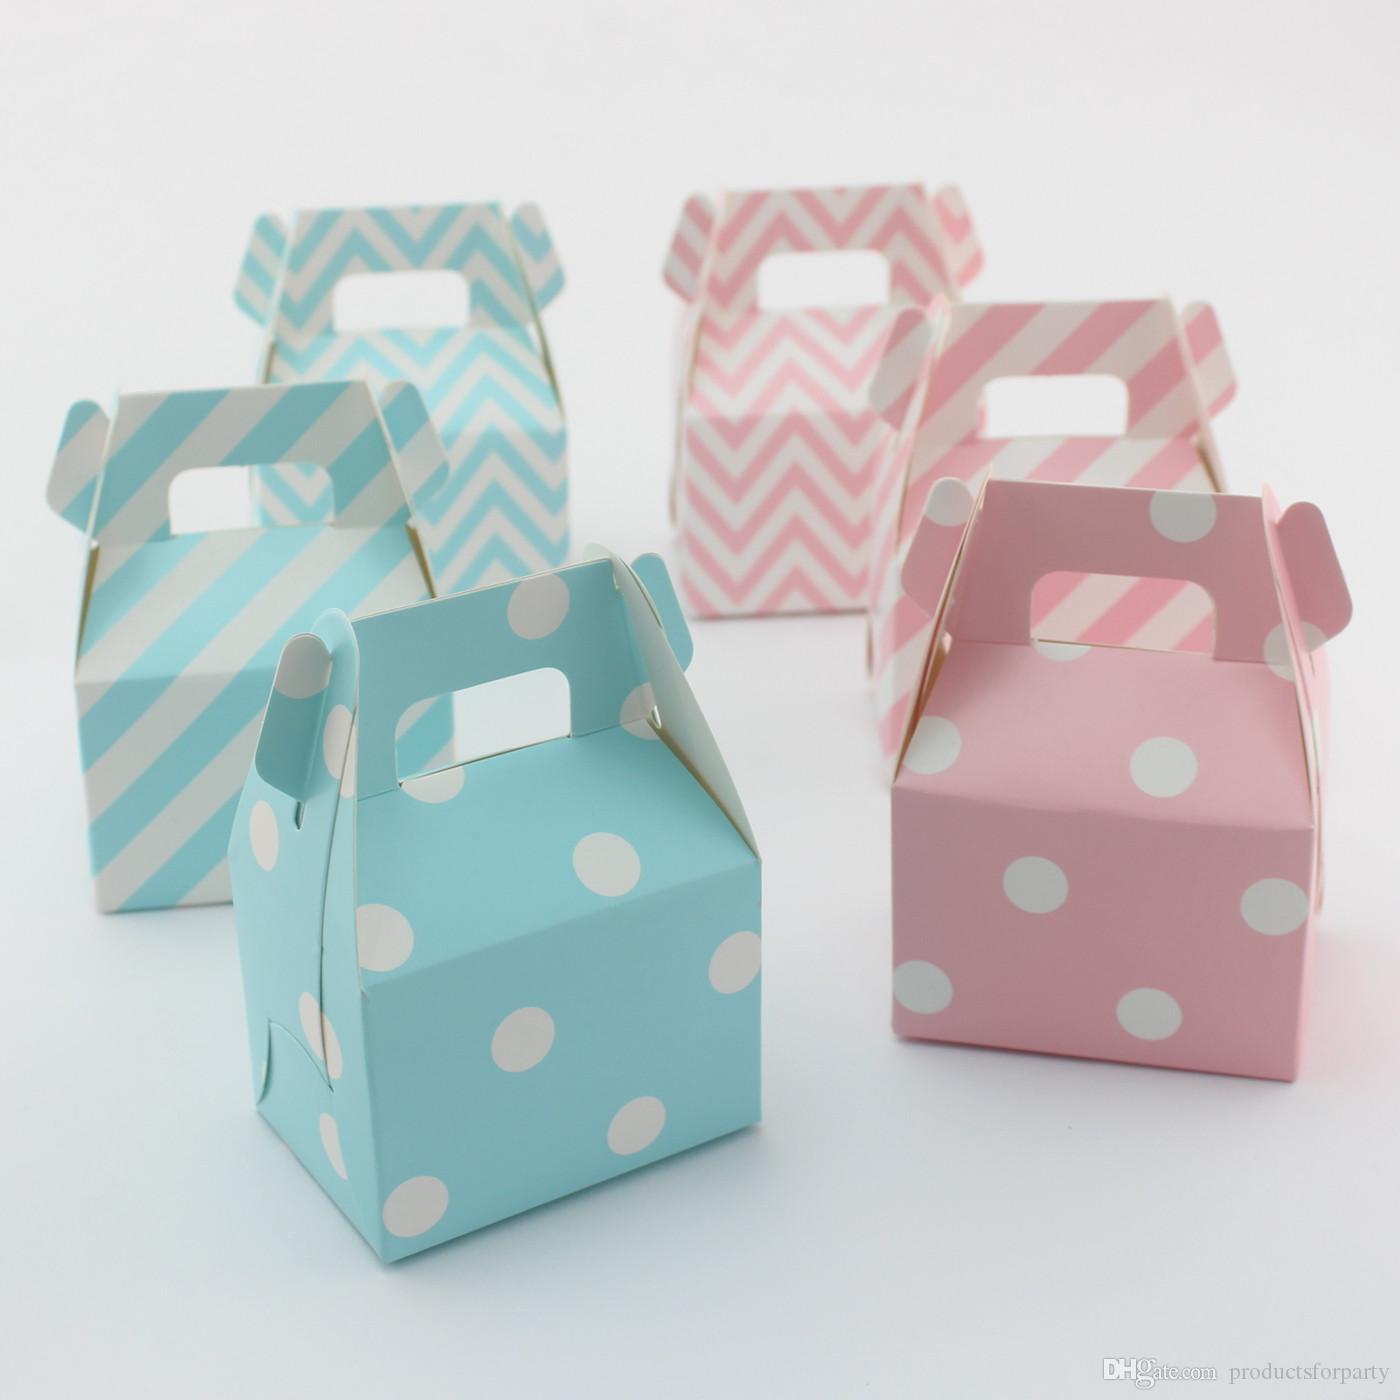 Order a paper gift box diy